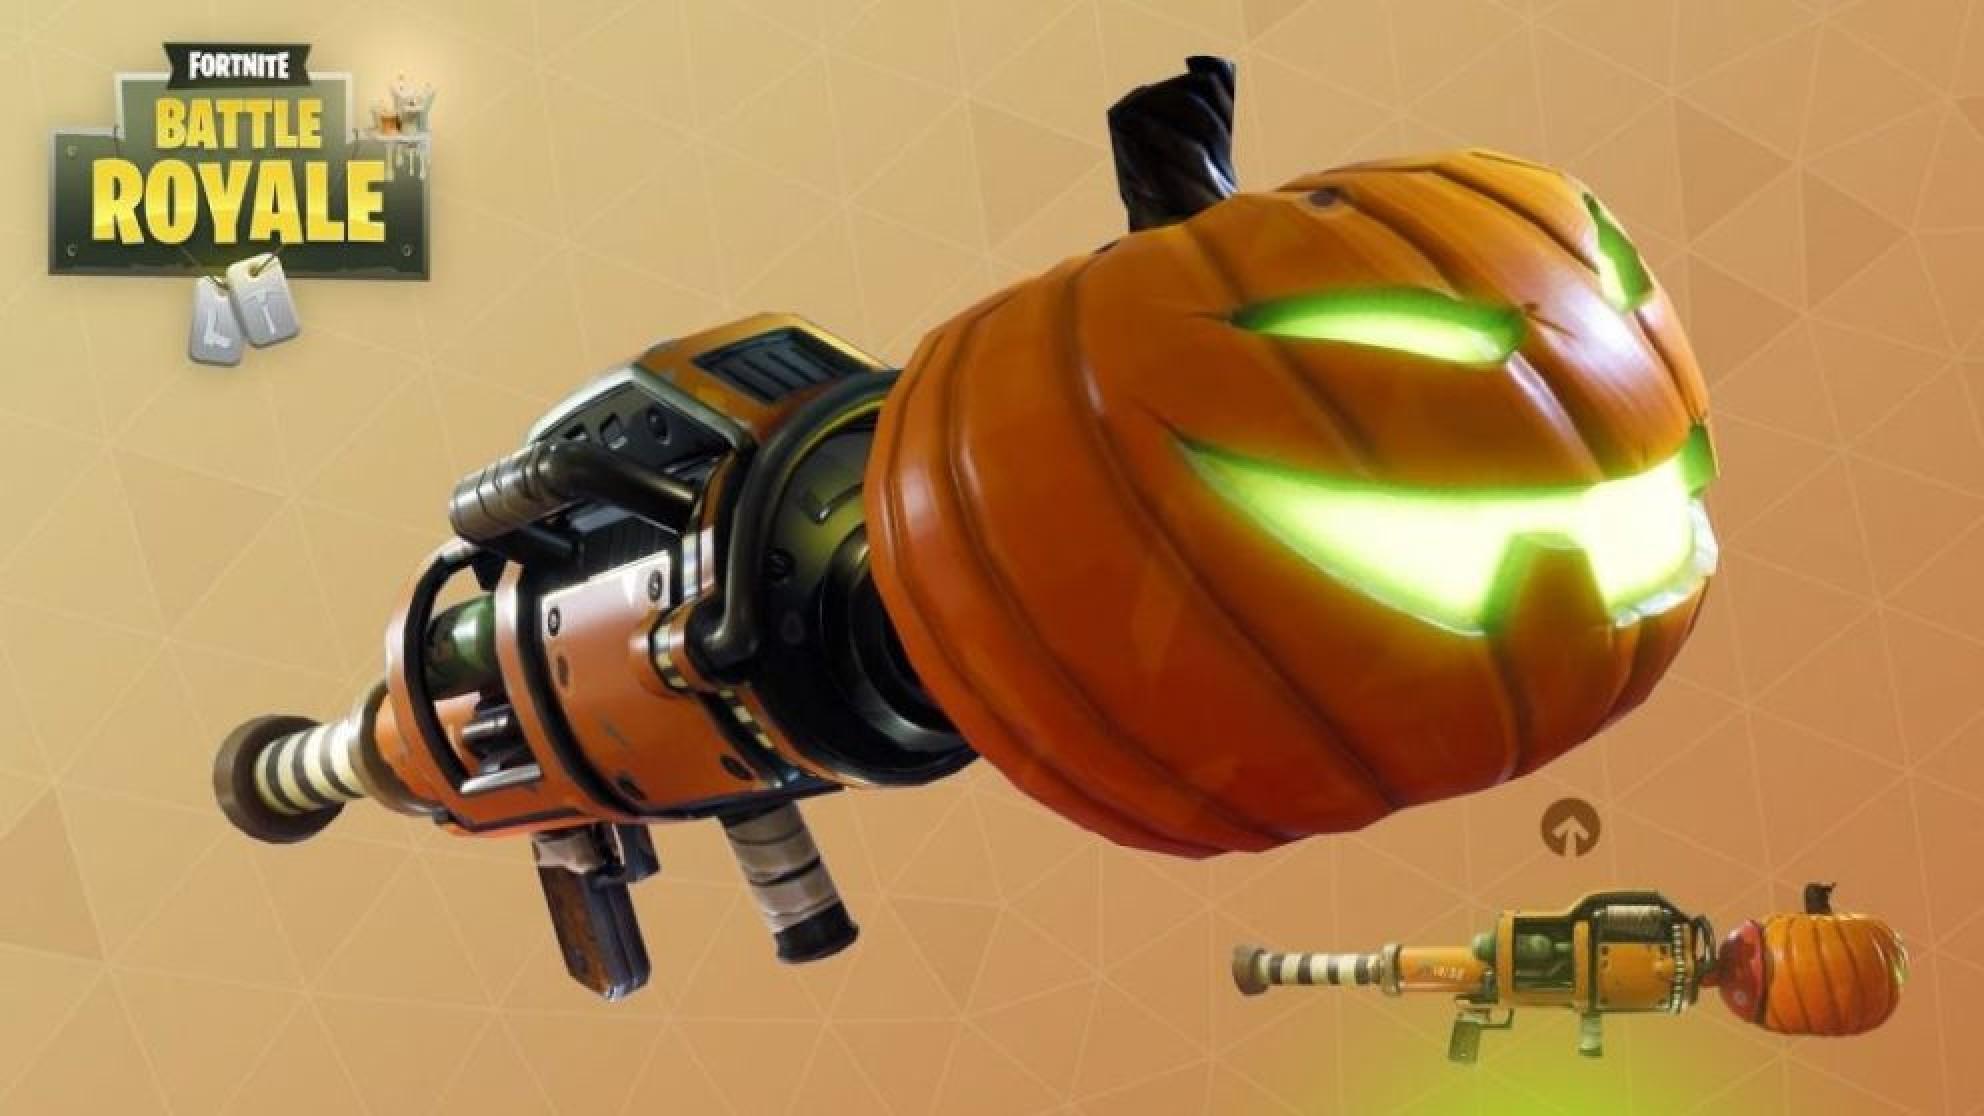 Pumpkin Rocket Launcher returns to Fortnite